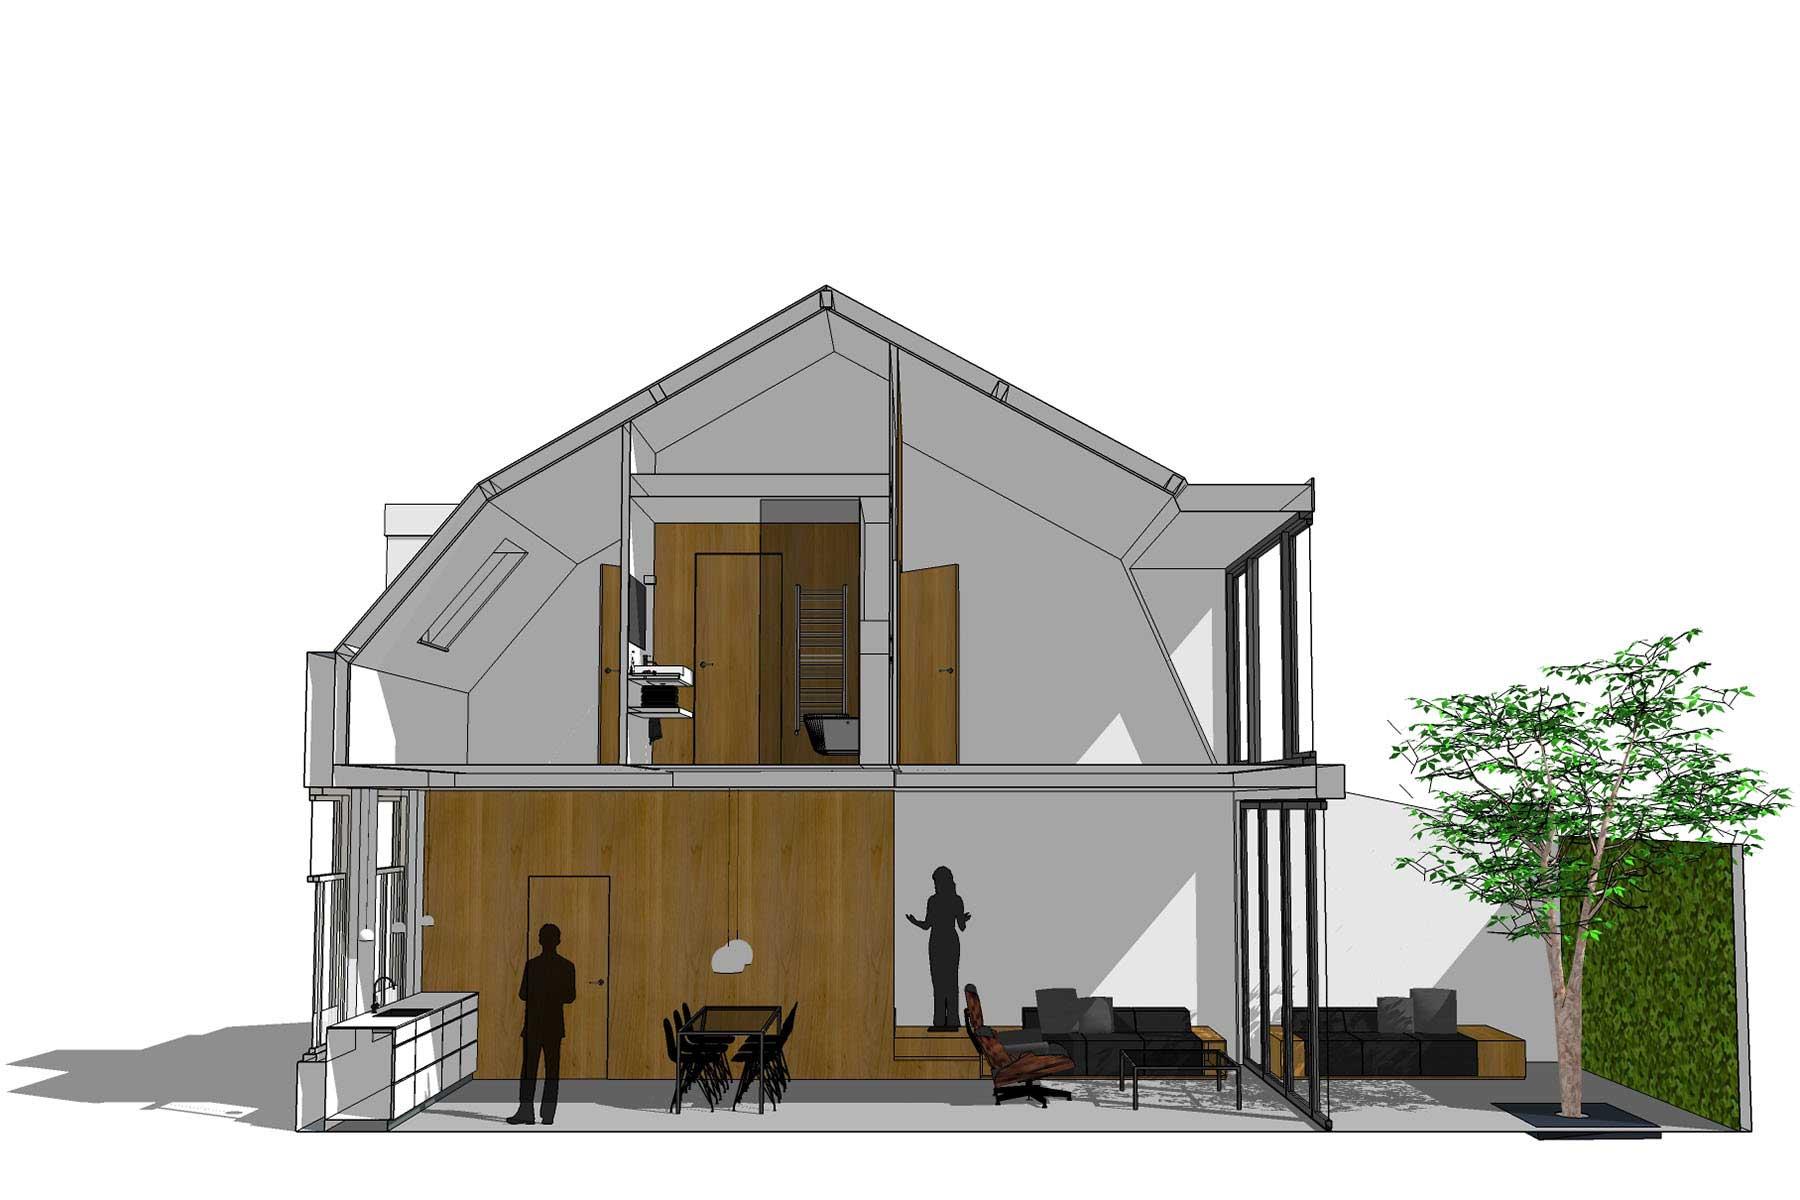 8A-Architecten-verbouwing-arbeiderswoning-09